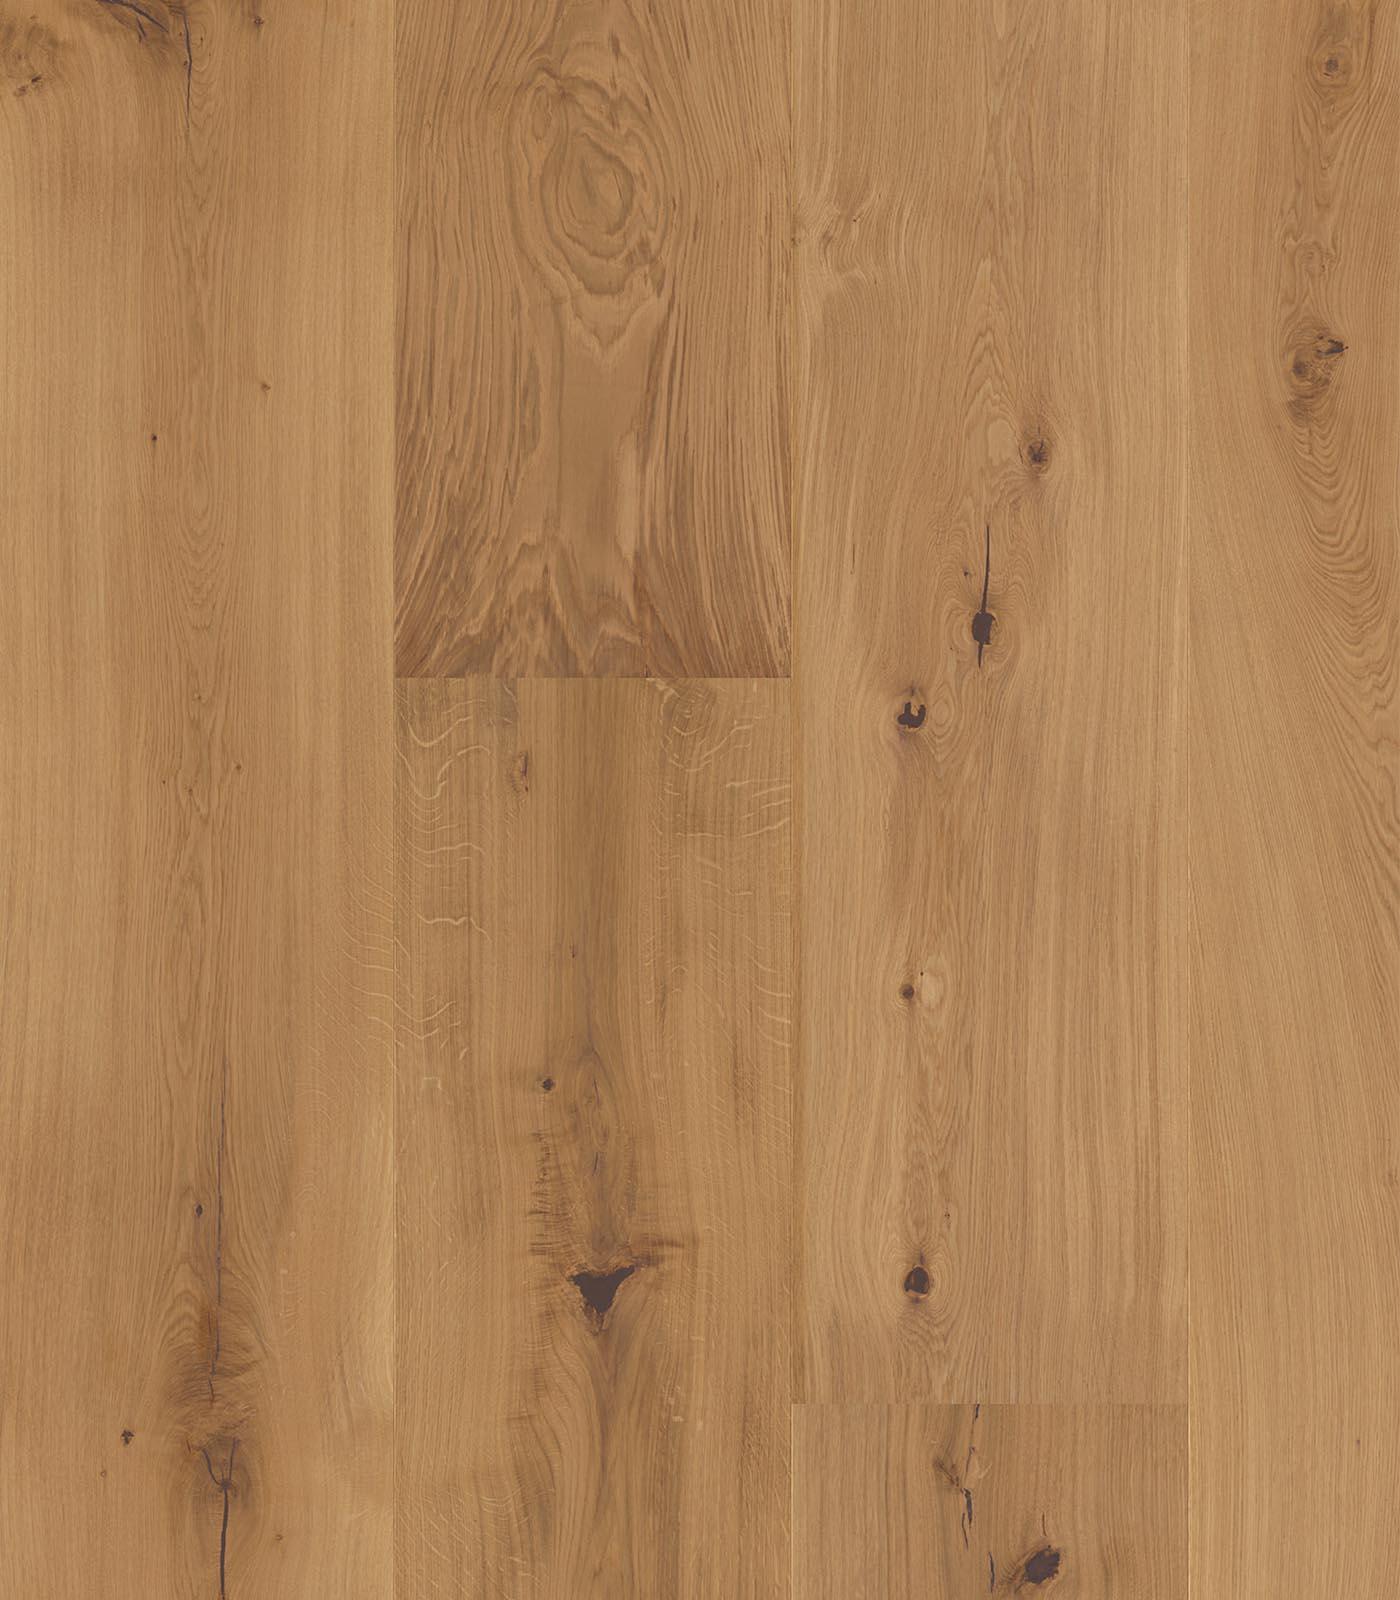 Semi-Fumed-European-Oak-Floors-Origins-Collection-flat